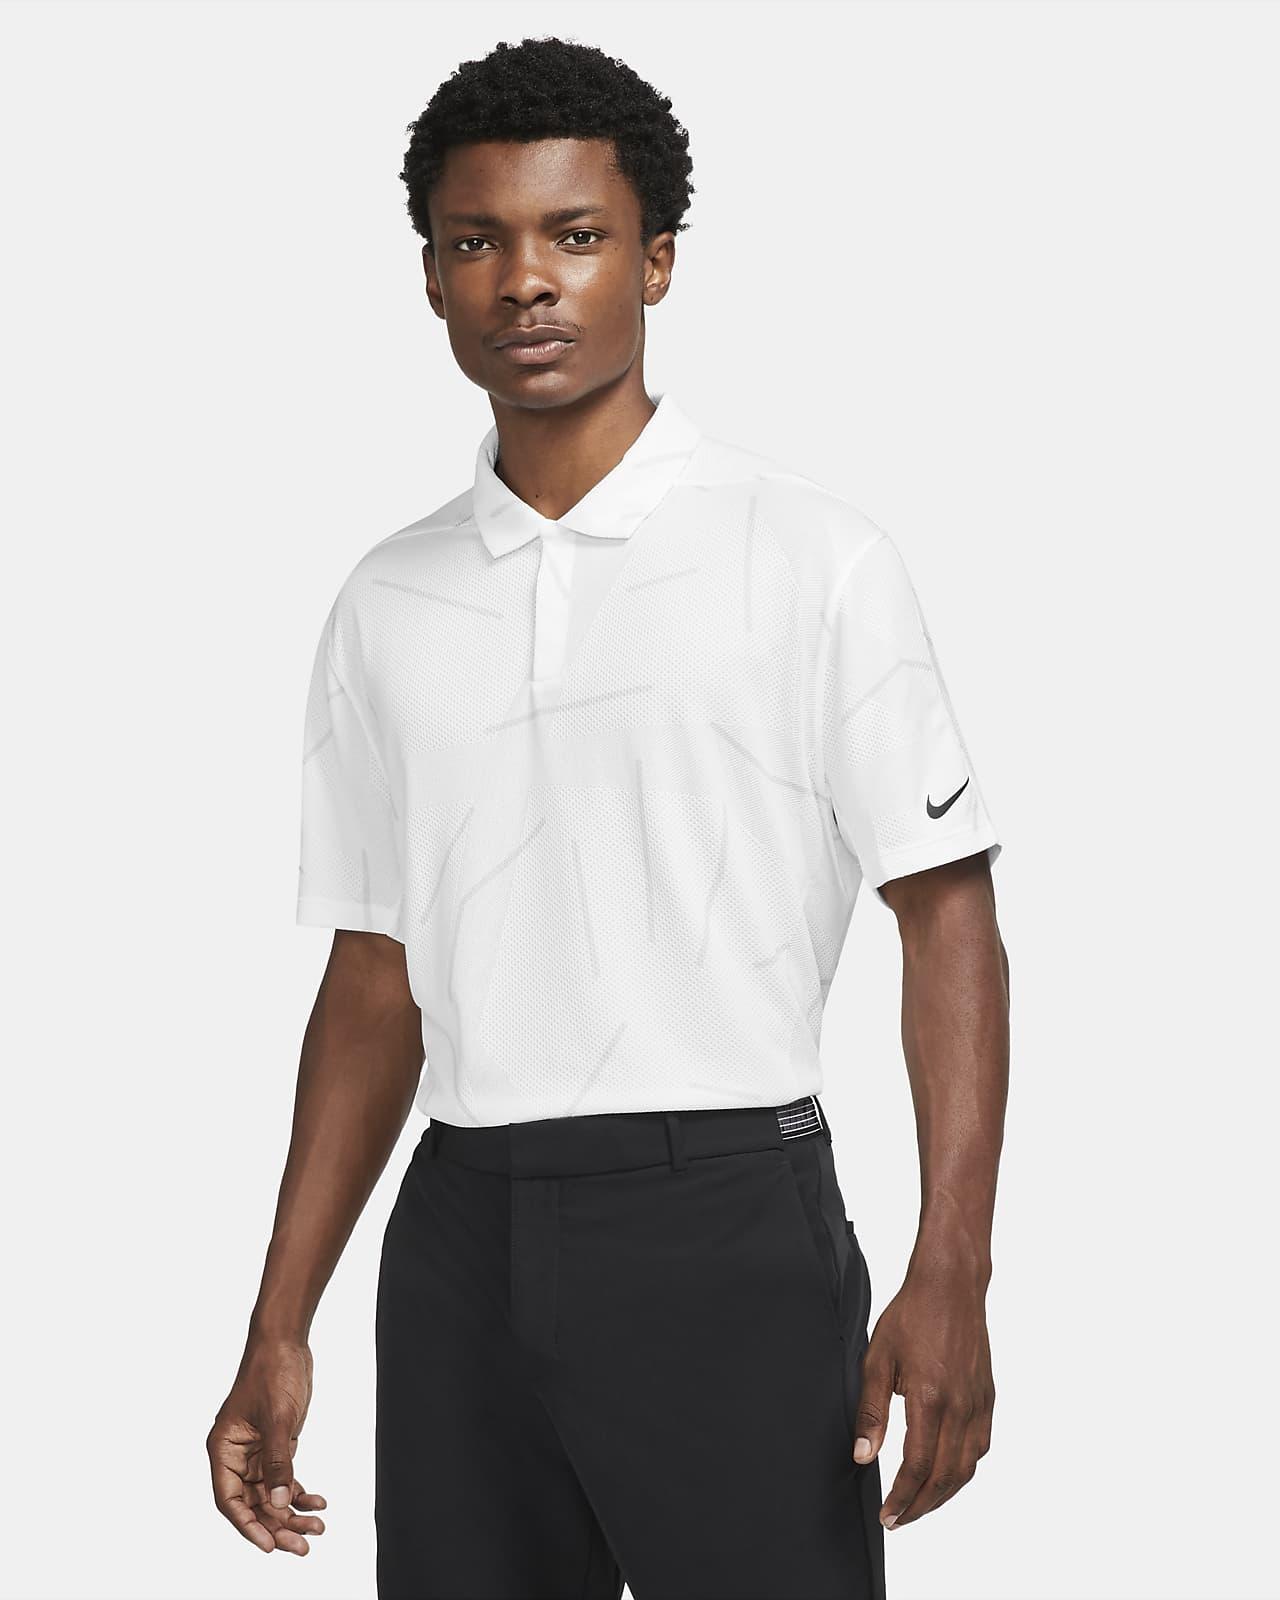 Polo de golf para hombre Nike Dri-FIT Tiger Woods